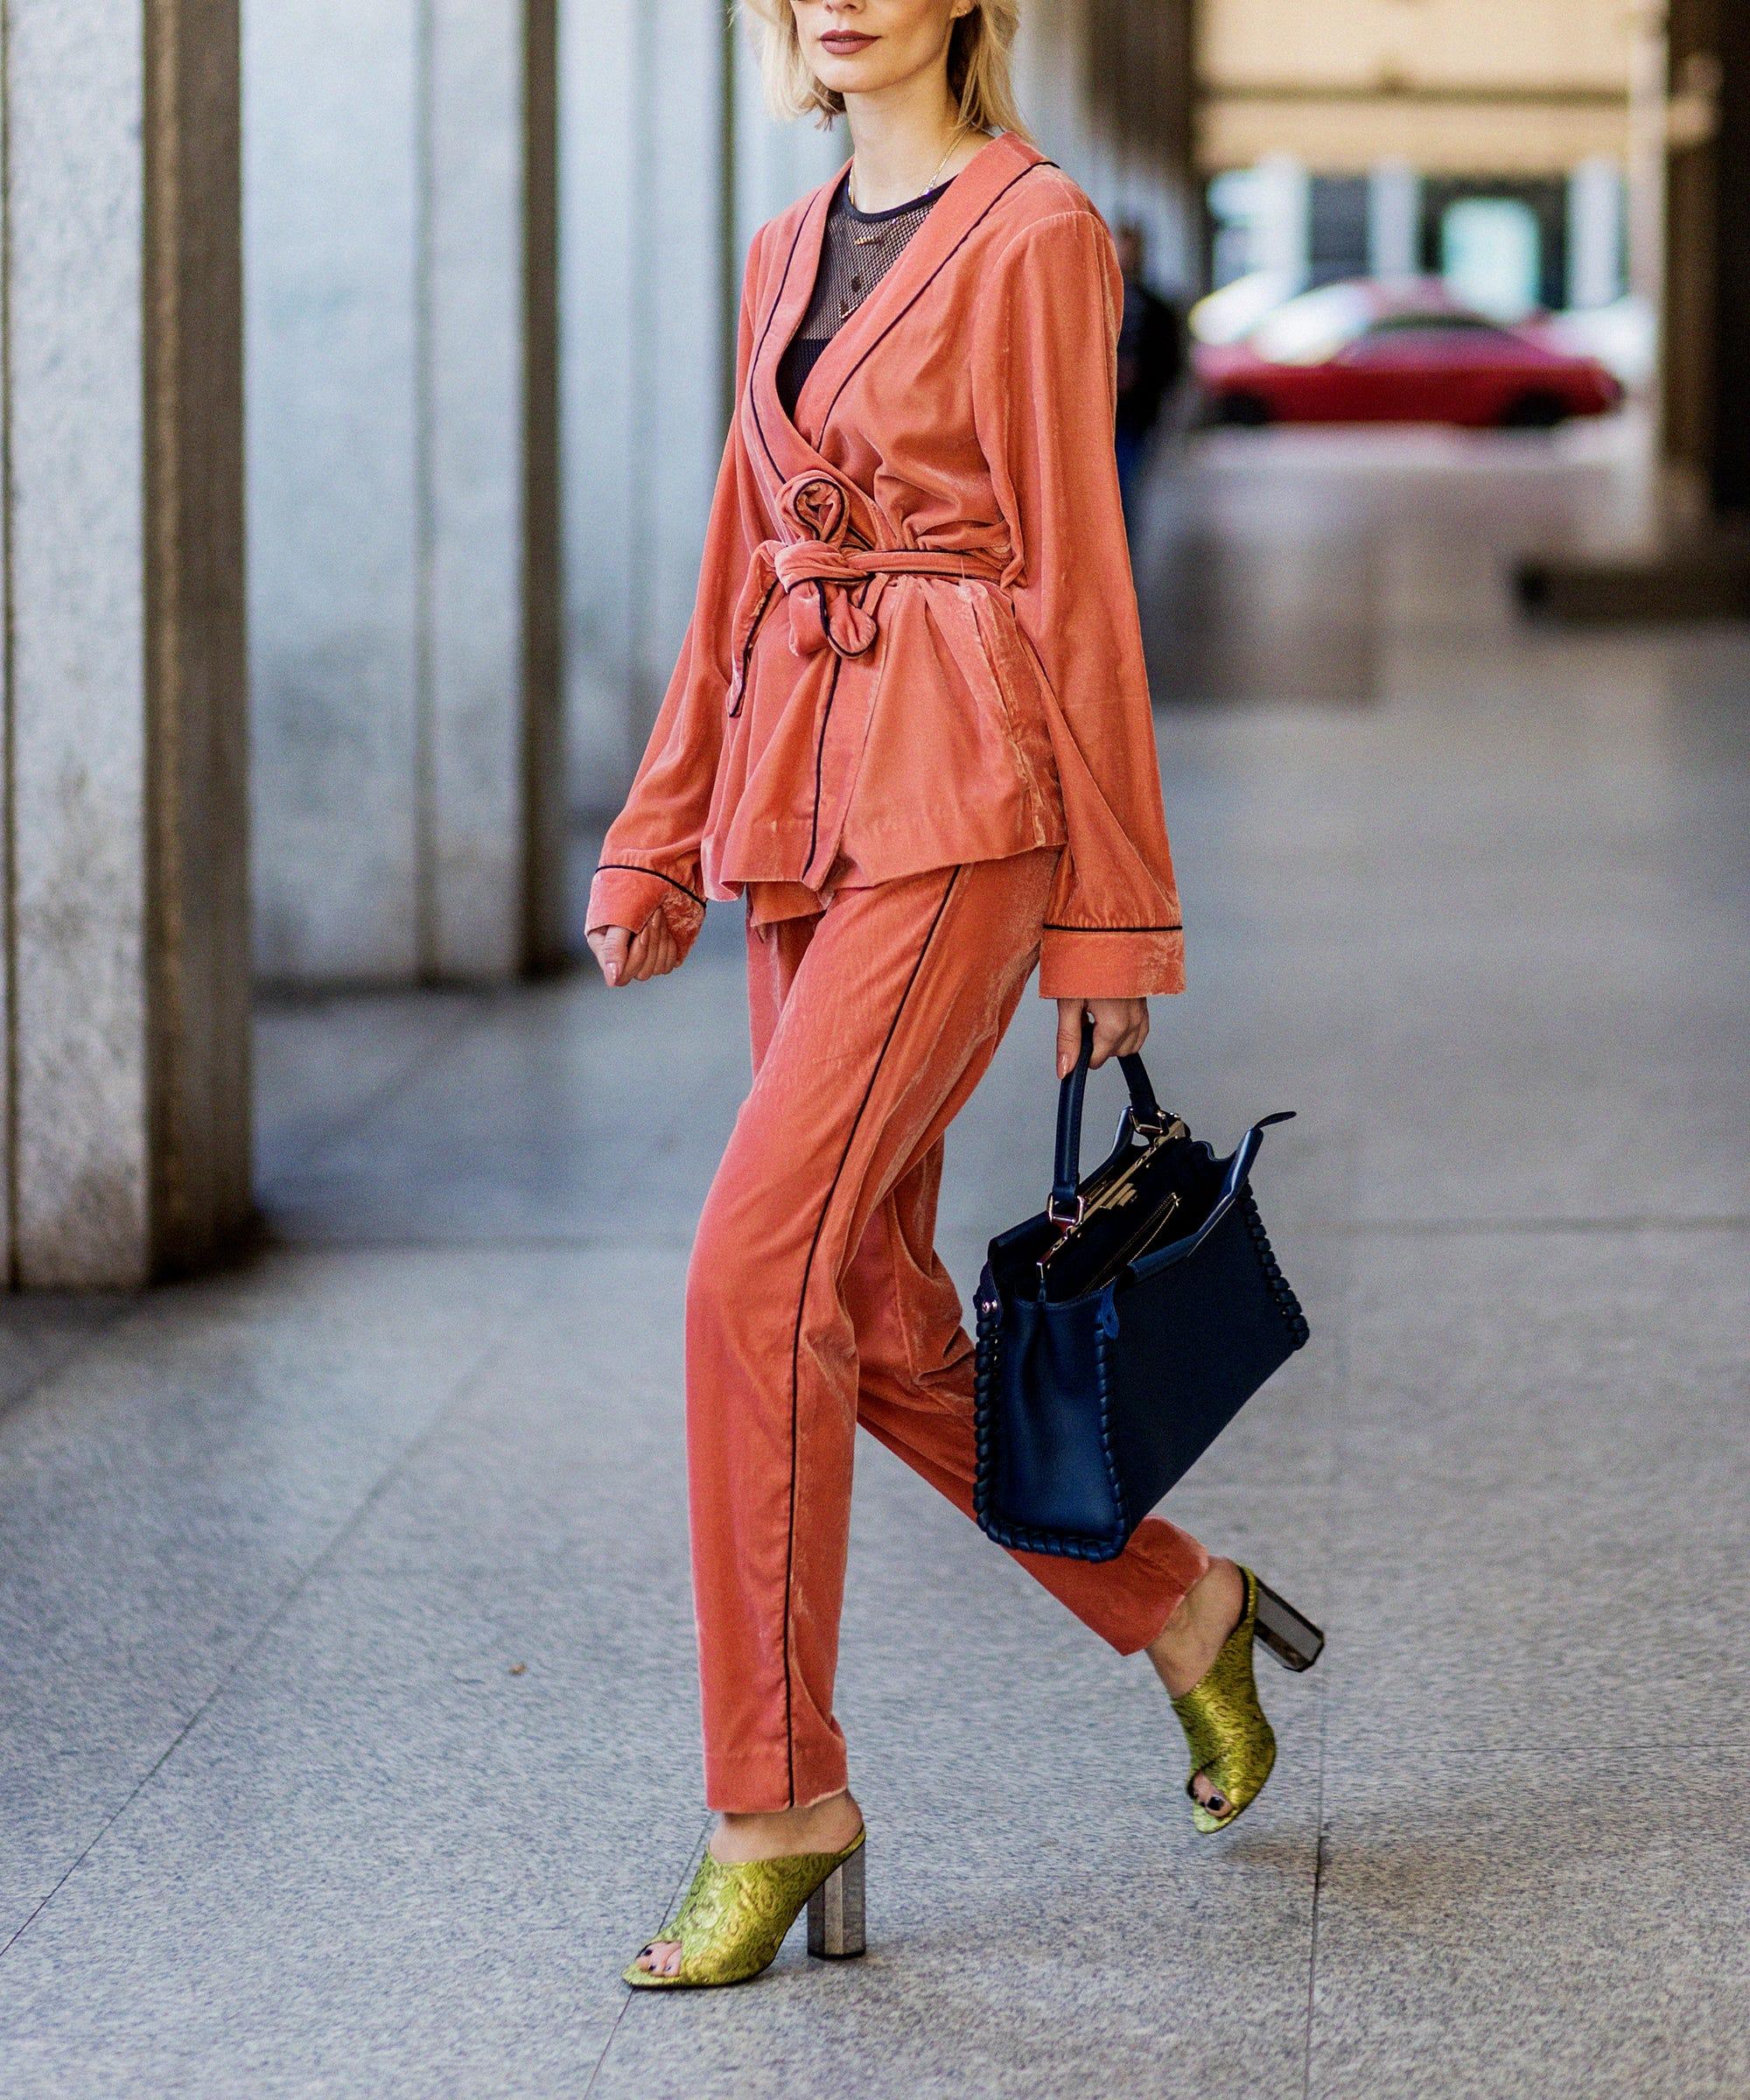 Pajamas Outfits Trend - Sleepwear Street Style Photos 6eeea9130